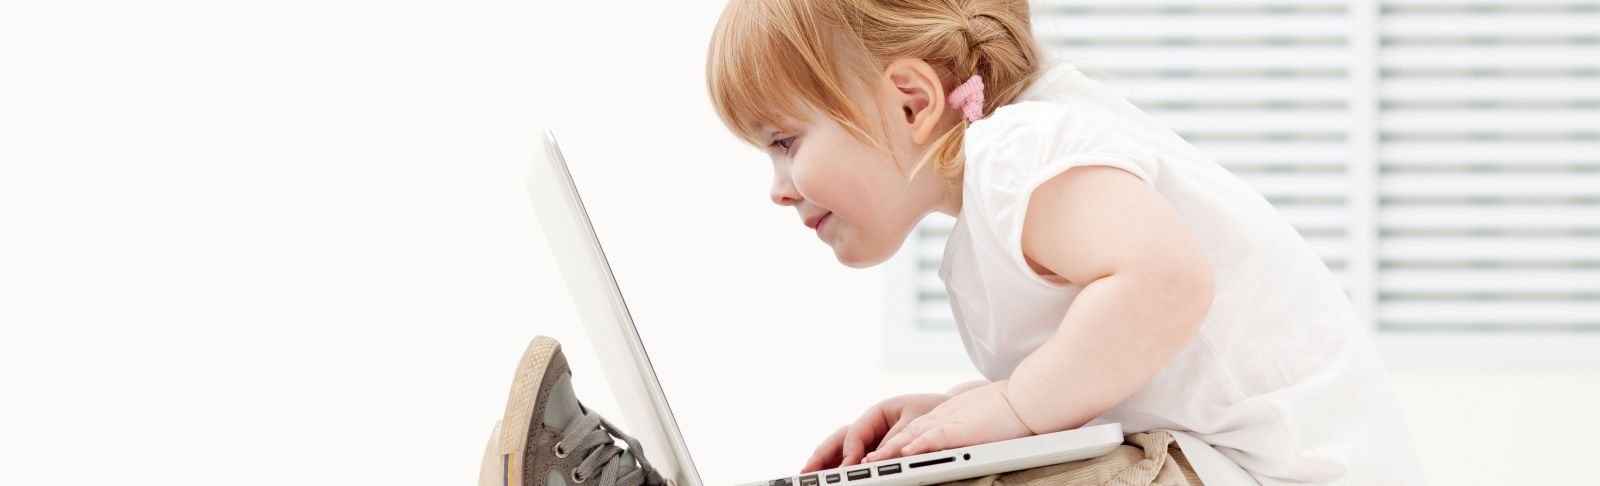 Les eines digitals ja formen part dels recursos educatius | Acistock